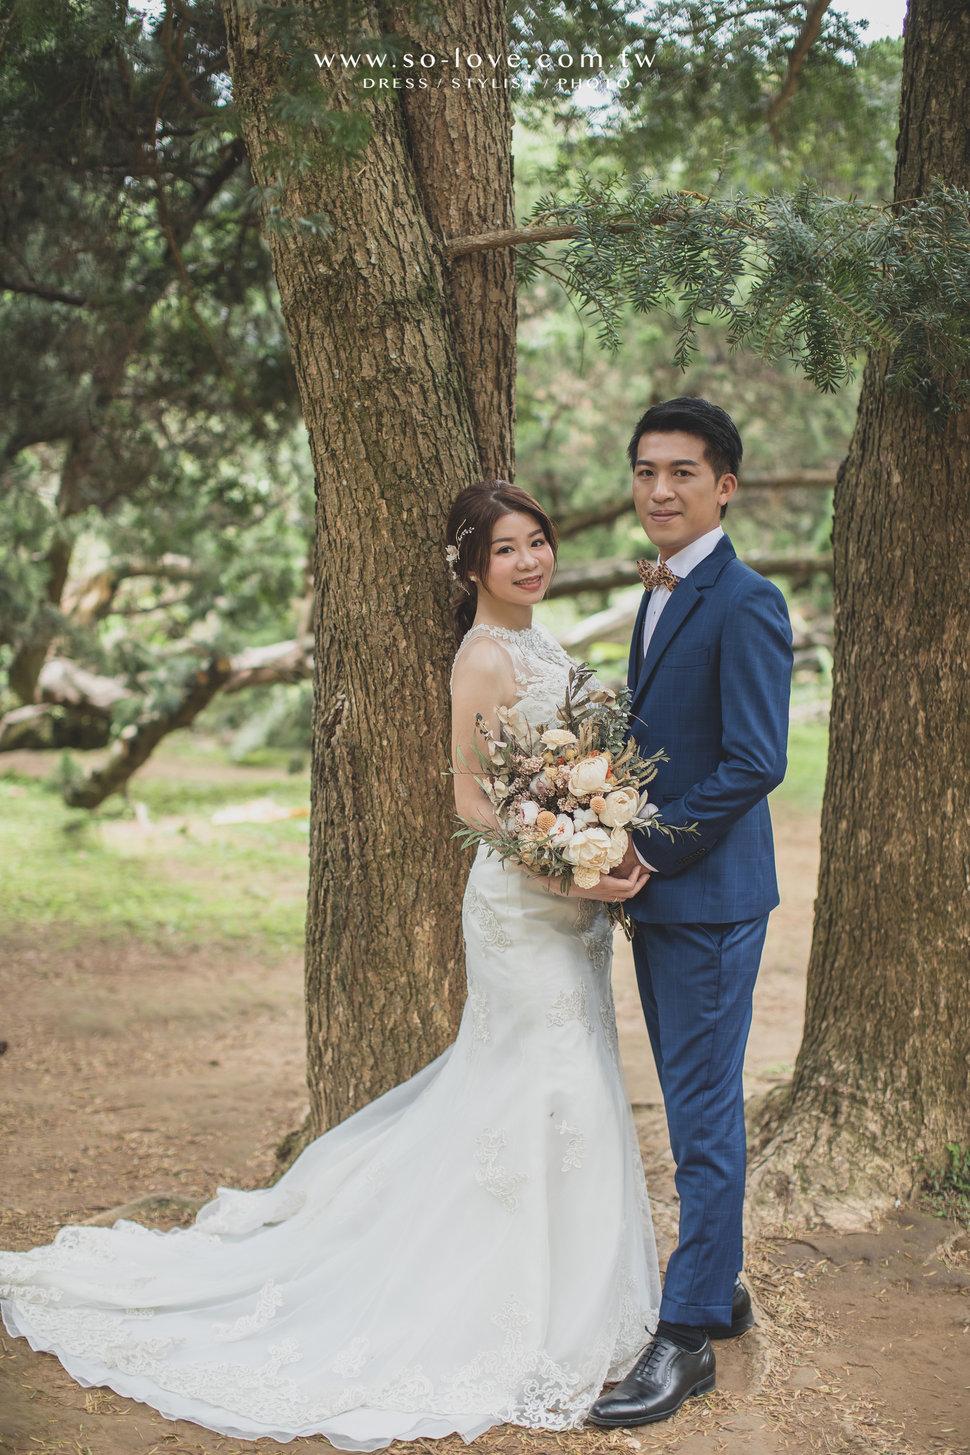 RYAN8123 - So.Love Wedding 樂樂蕾絲《結婚吧》